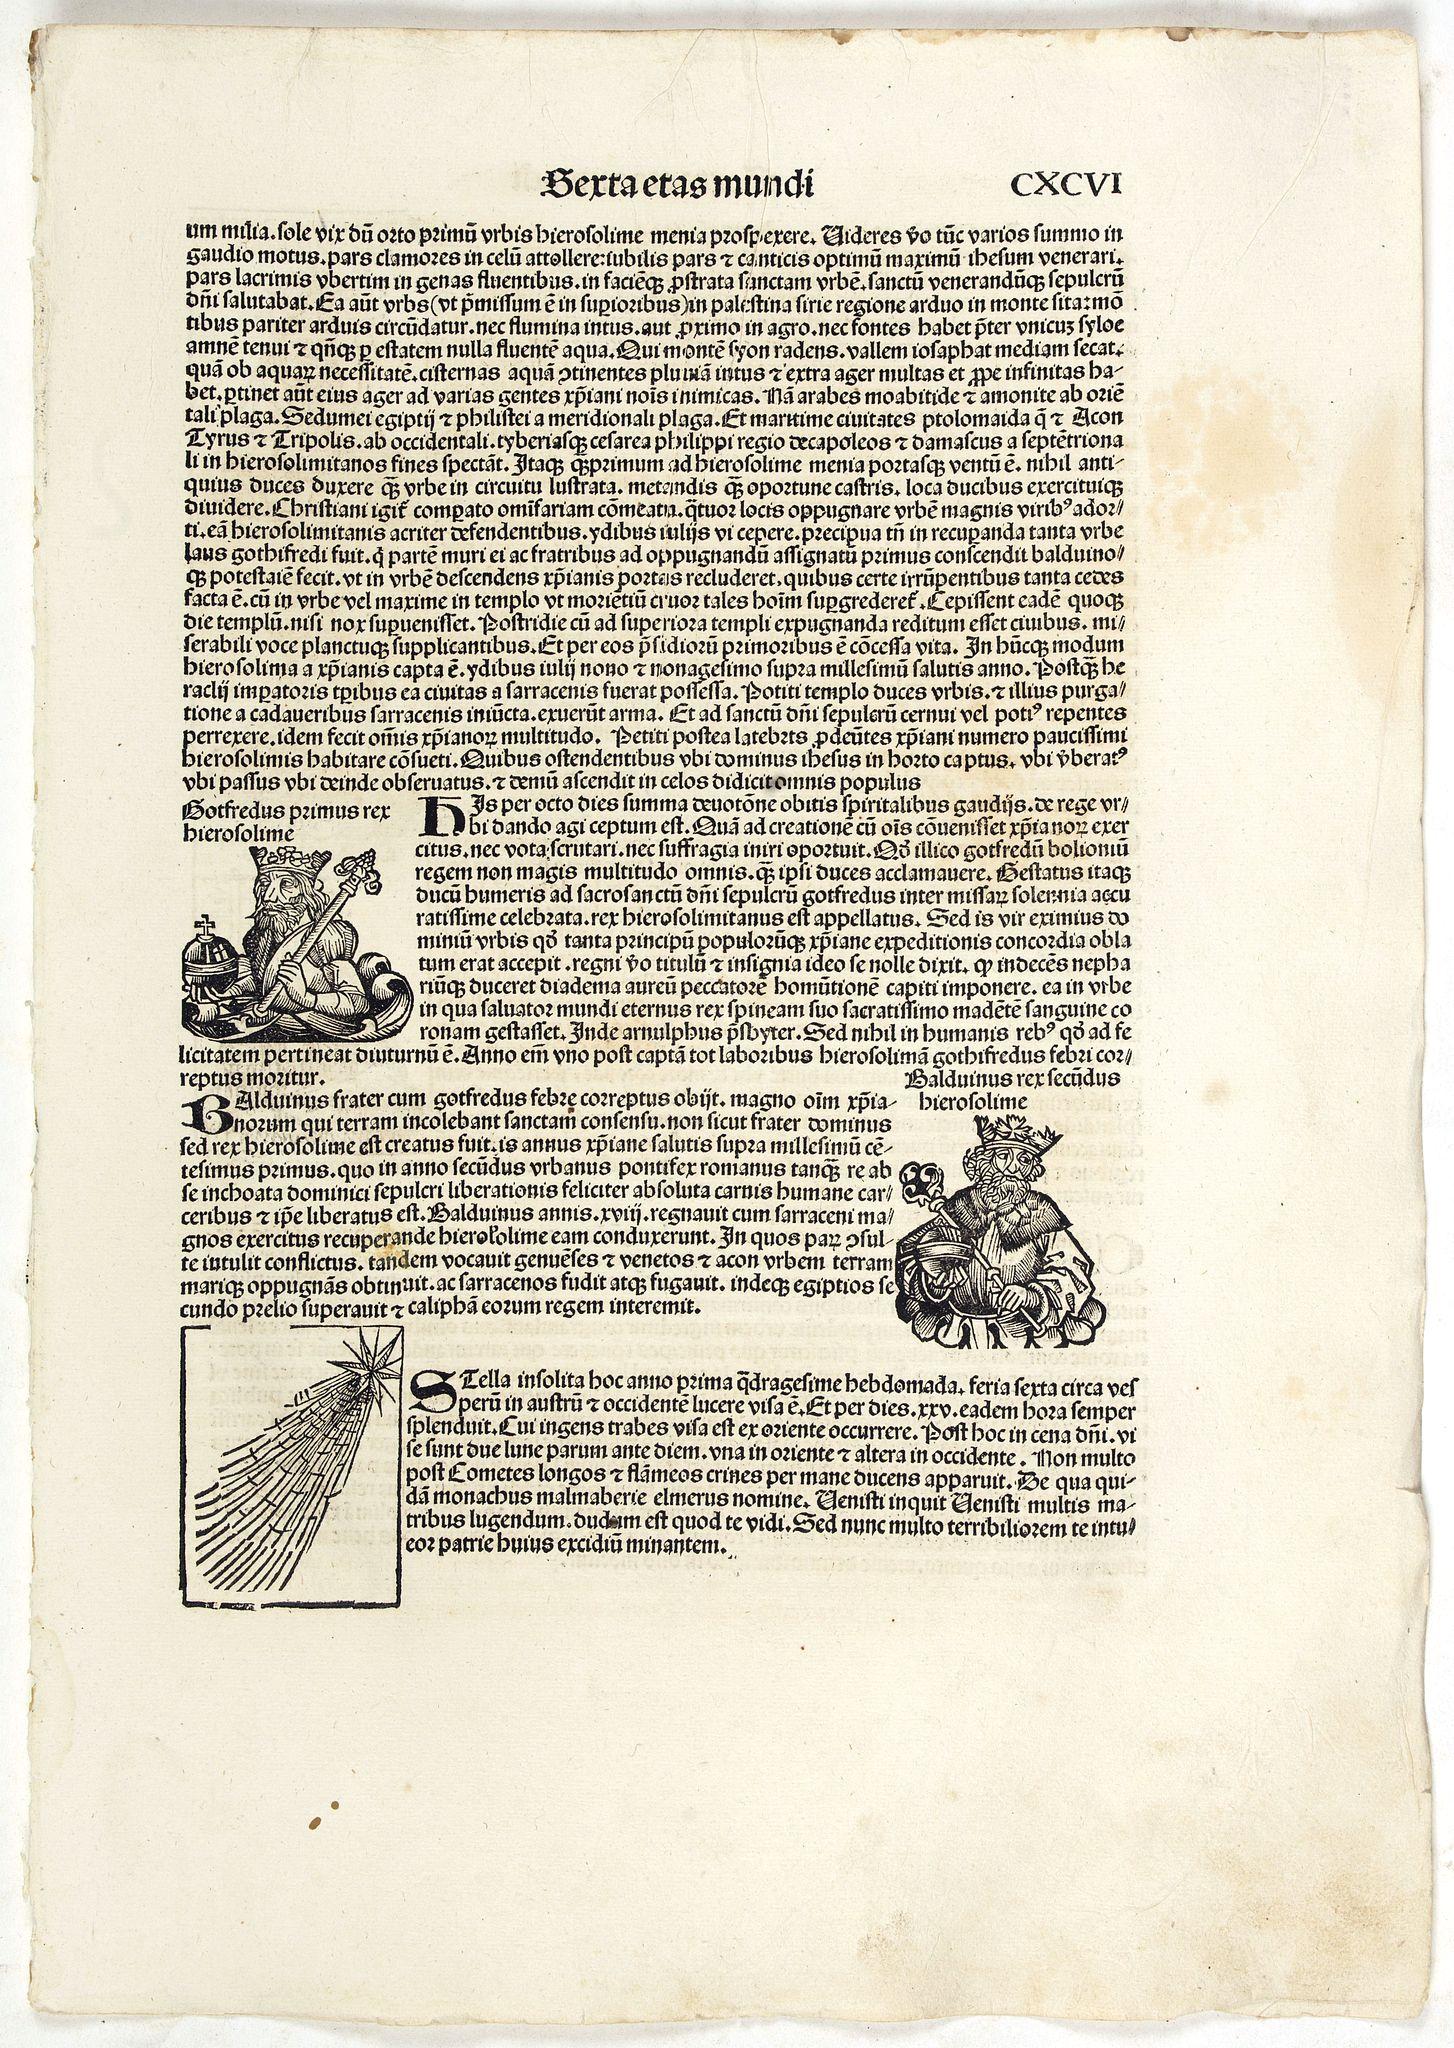 SCHEDEL, H. -  Terta Etas Mundi. Folium. CXCVI